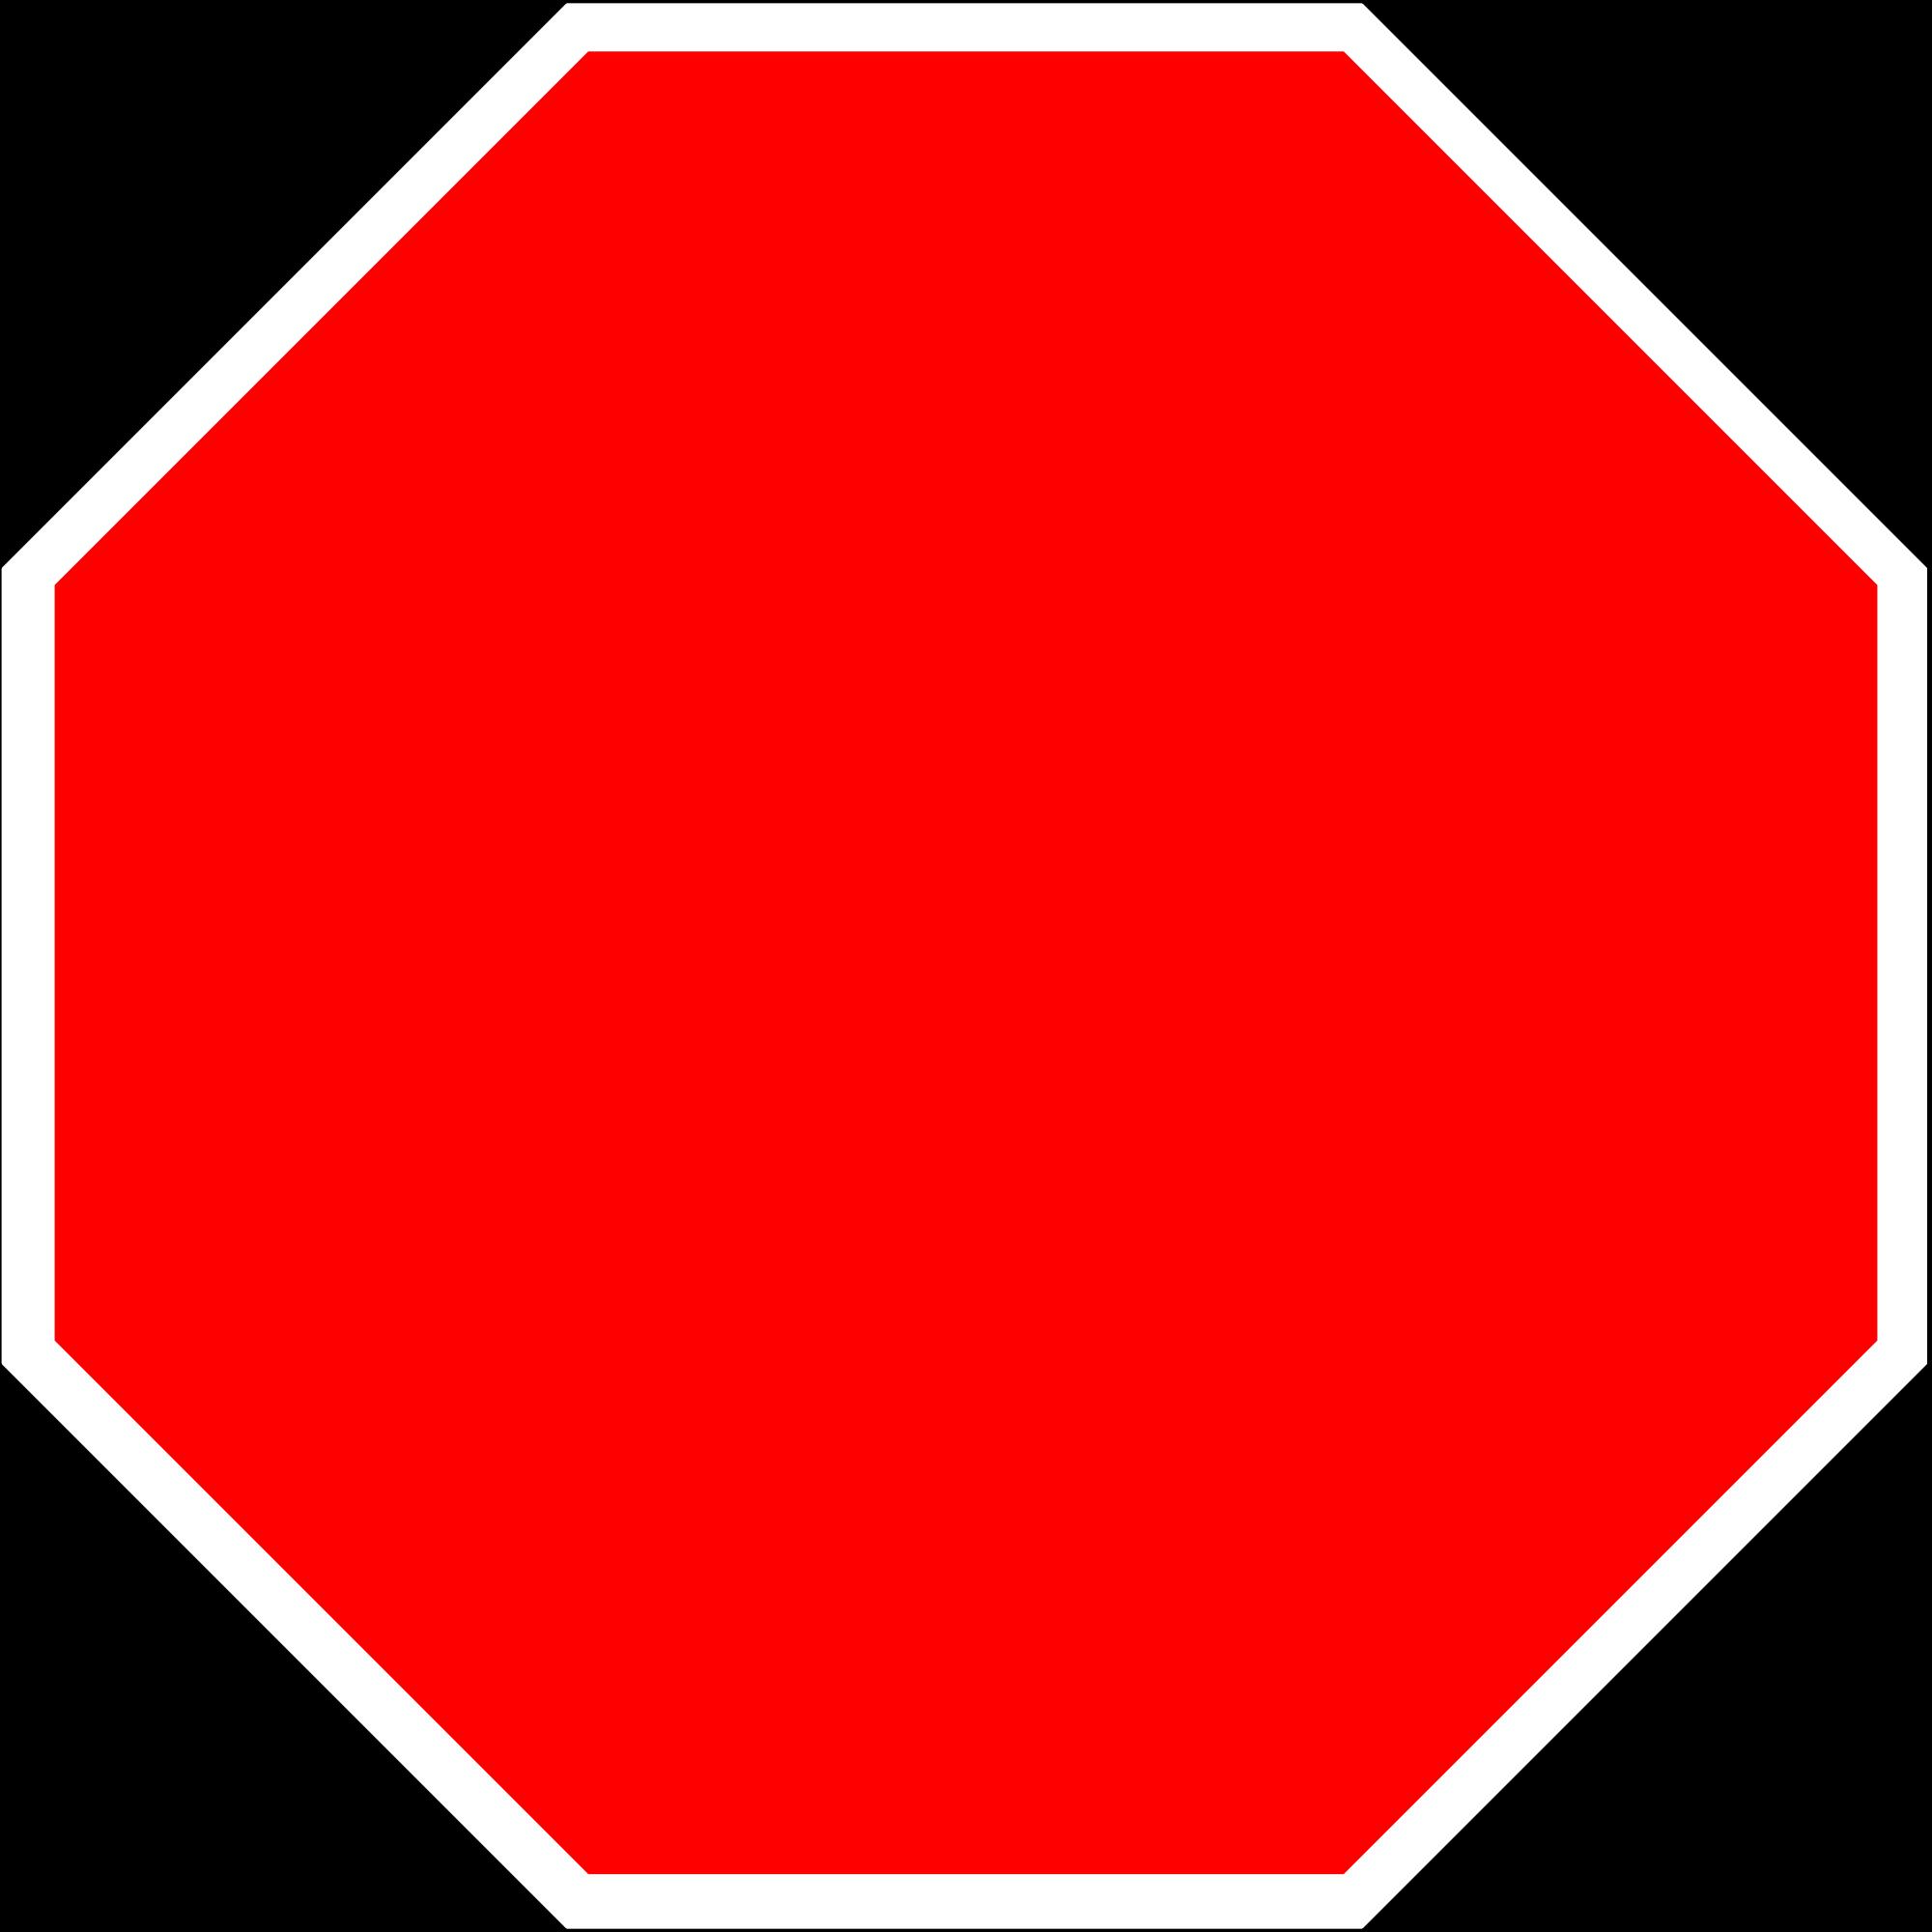 Stop signs clip art tumundografico 4